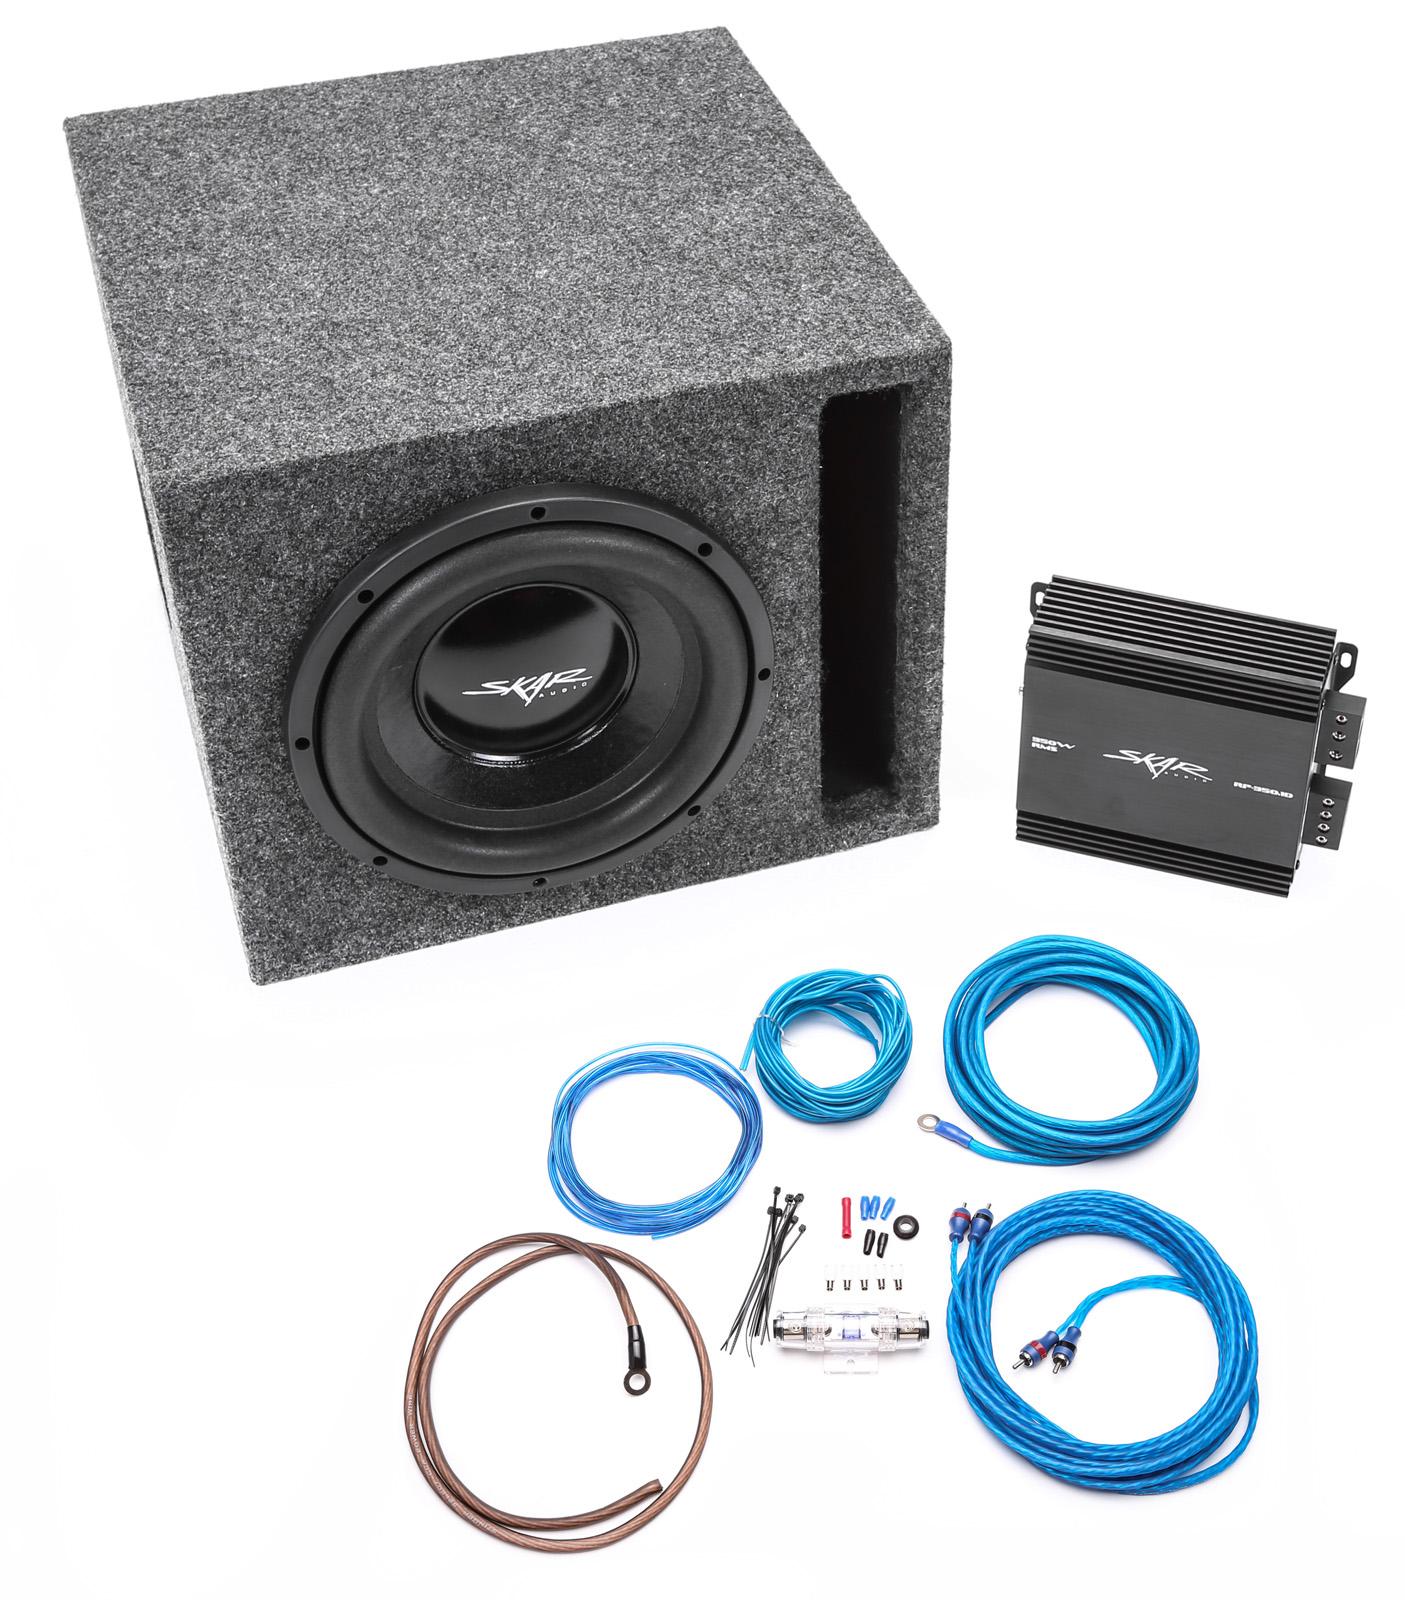 Skar Audio Wiring Diagrams Schematics Ev10 Diagram Single 10u2033 400 Watt Complete Bass Package With Loaded Box Amps